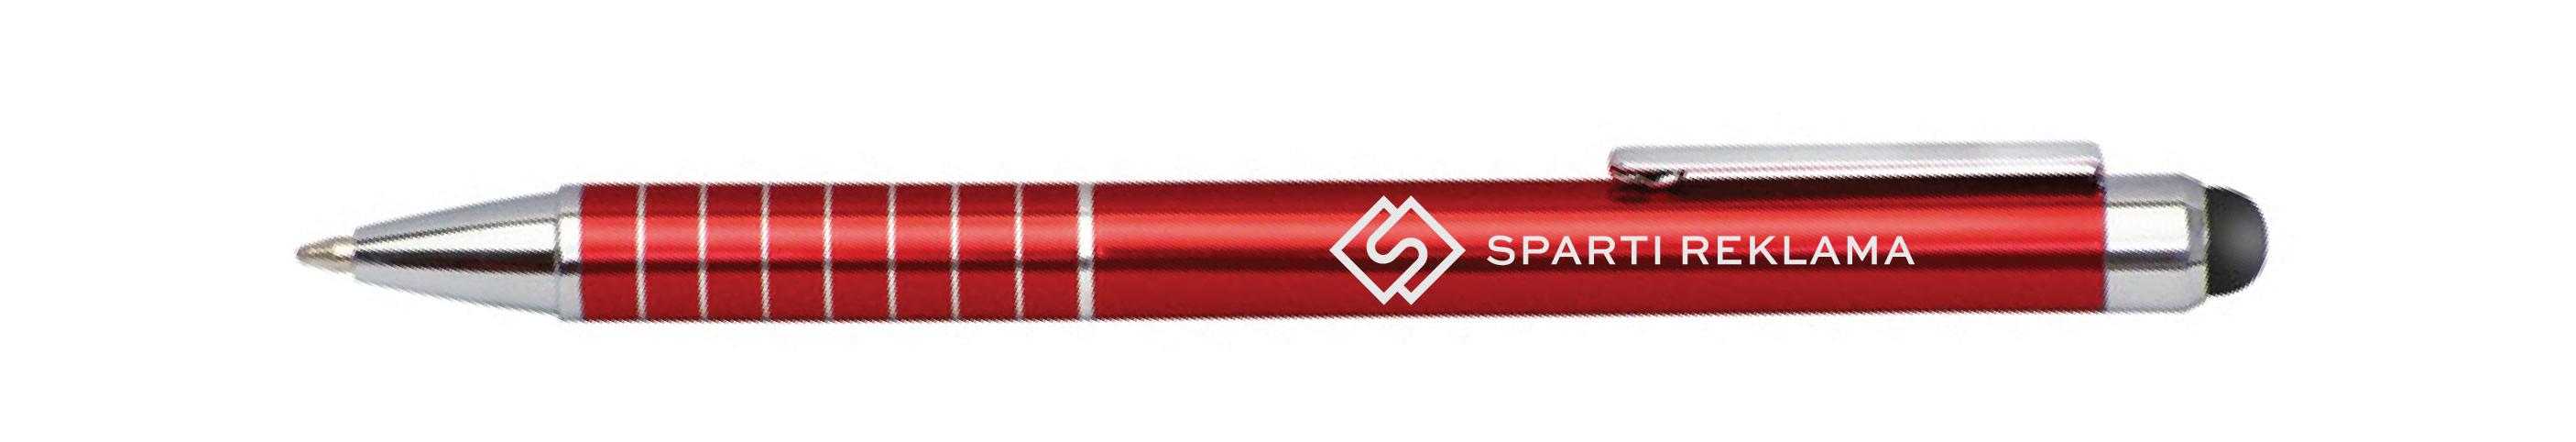 Impact_touch_sparti_reklama_logo_02